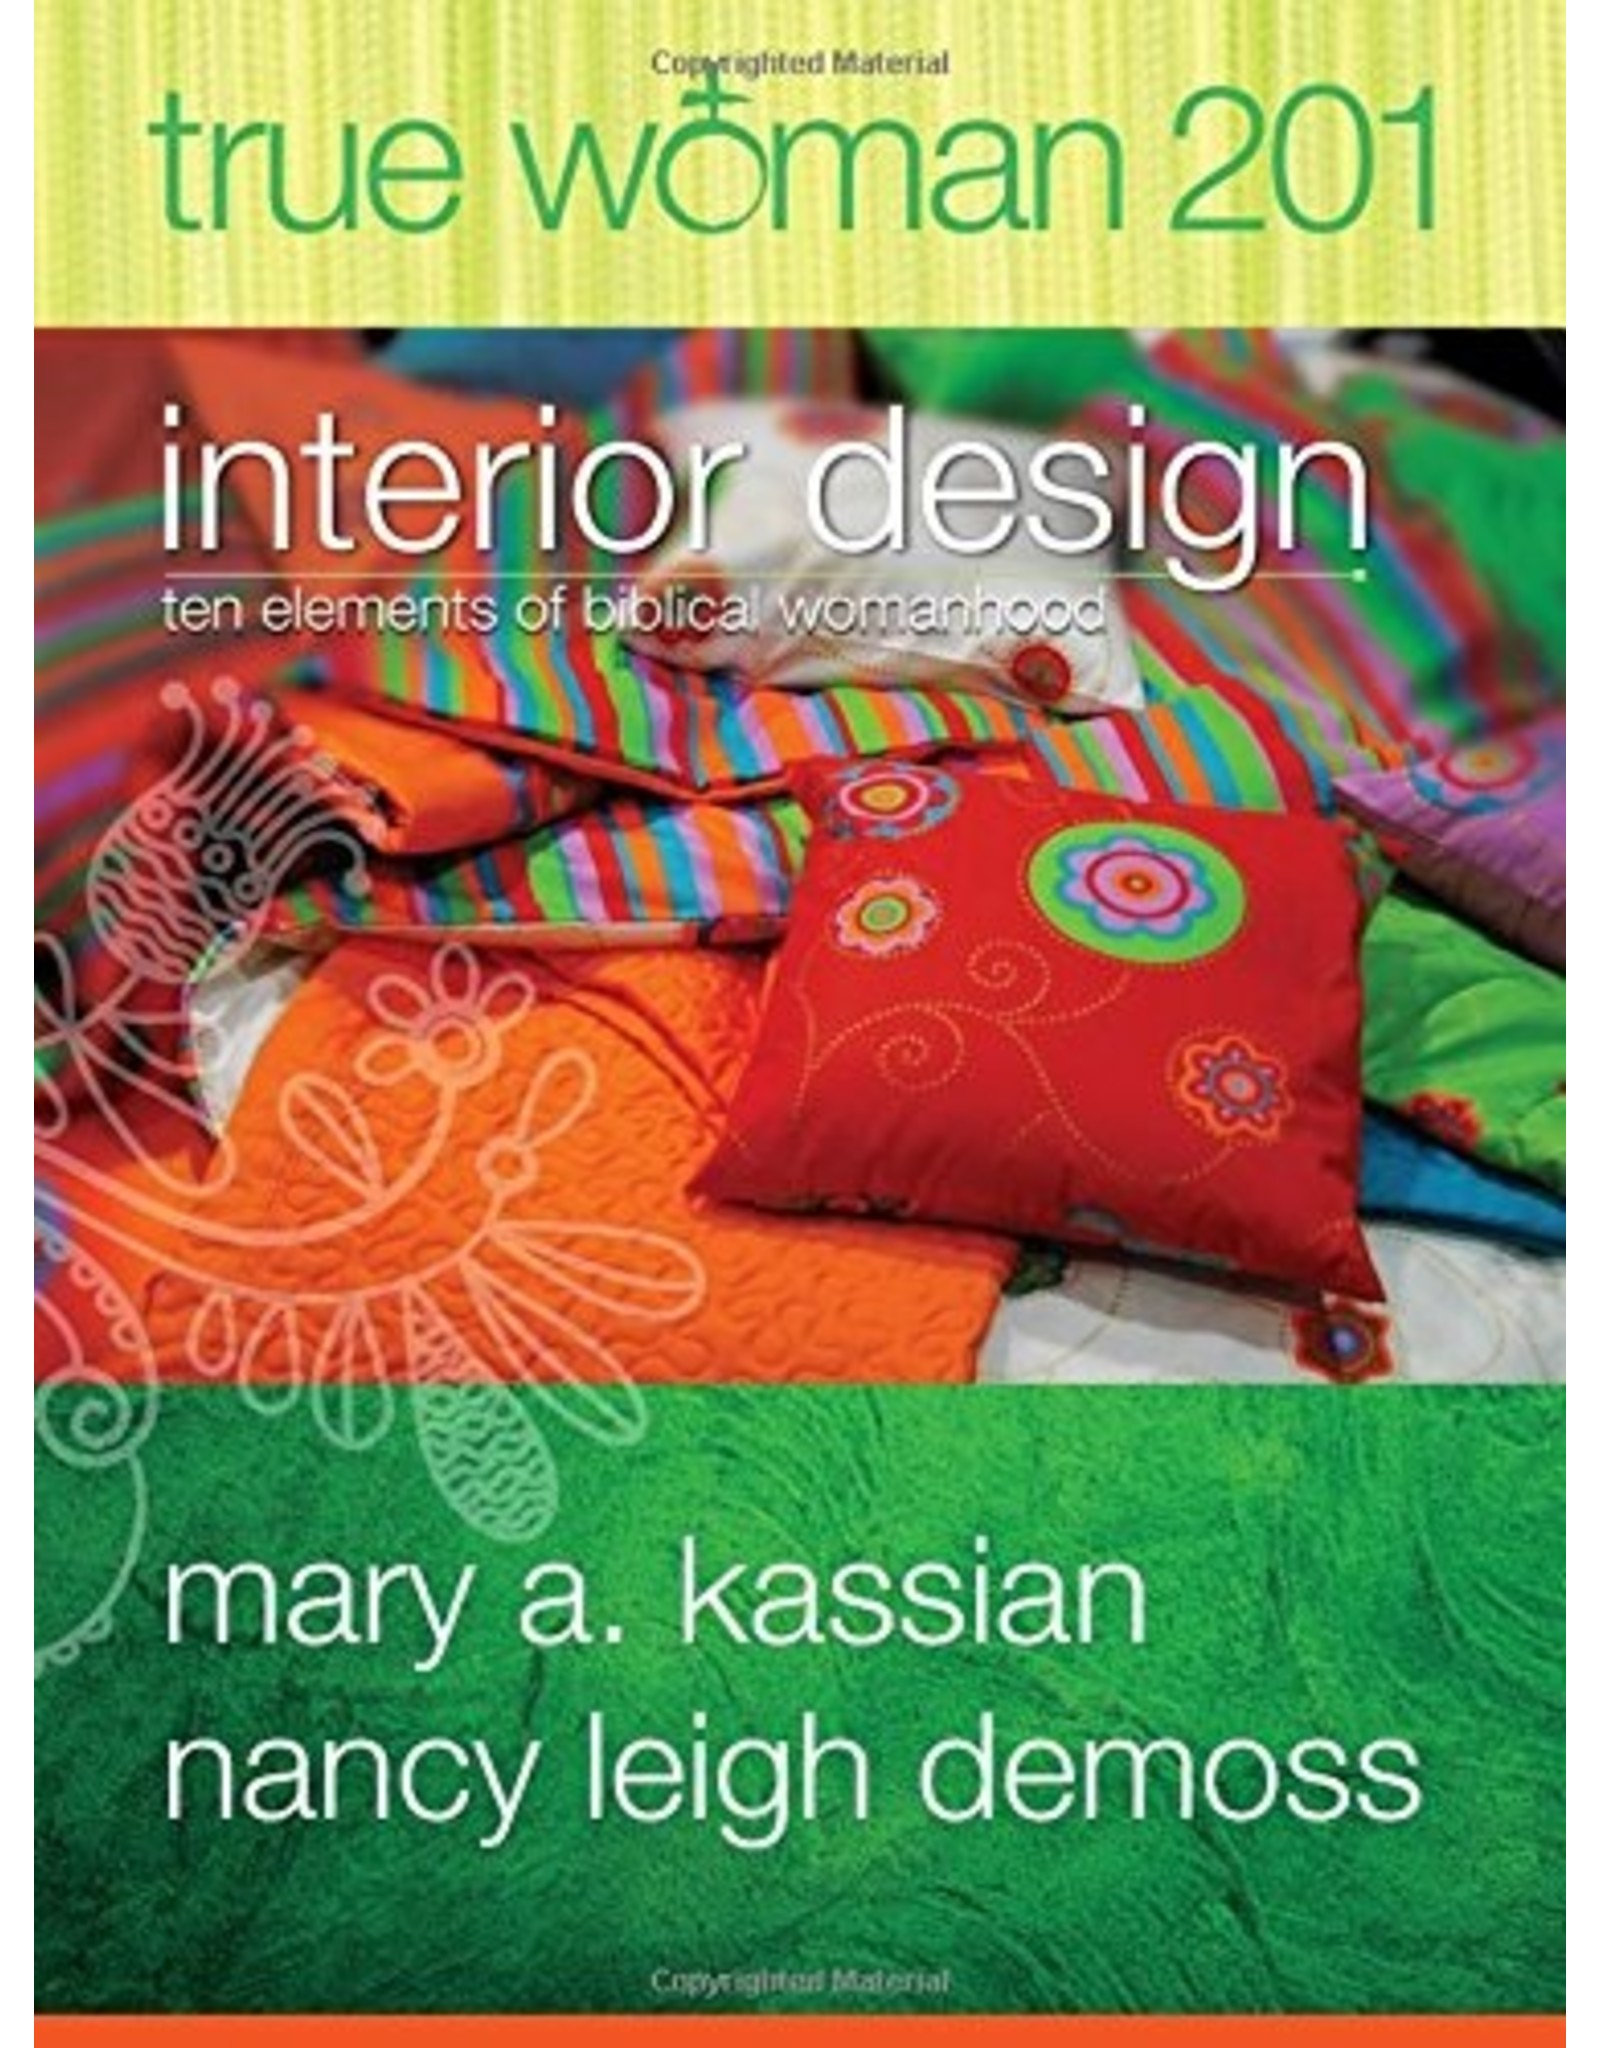 Moody Publishers True Woman 201: Interior Design - Ten Elements of Biblical Womanhood (True Woman)